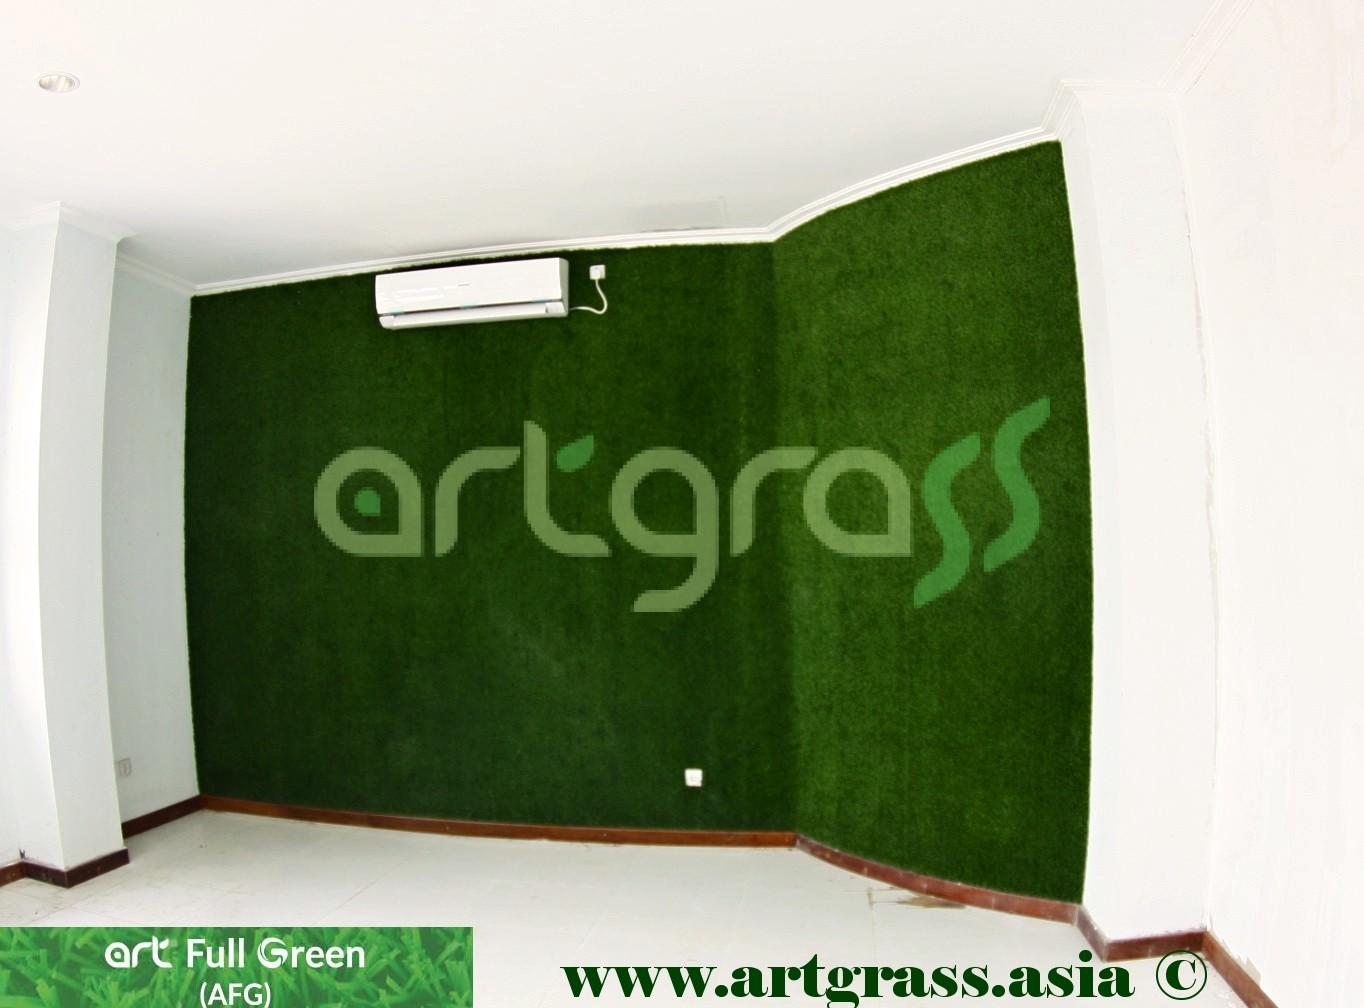 ArtGrass-Dinding-Ruangan-W1Lt2-Rumput-Sintetis-High